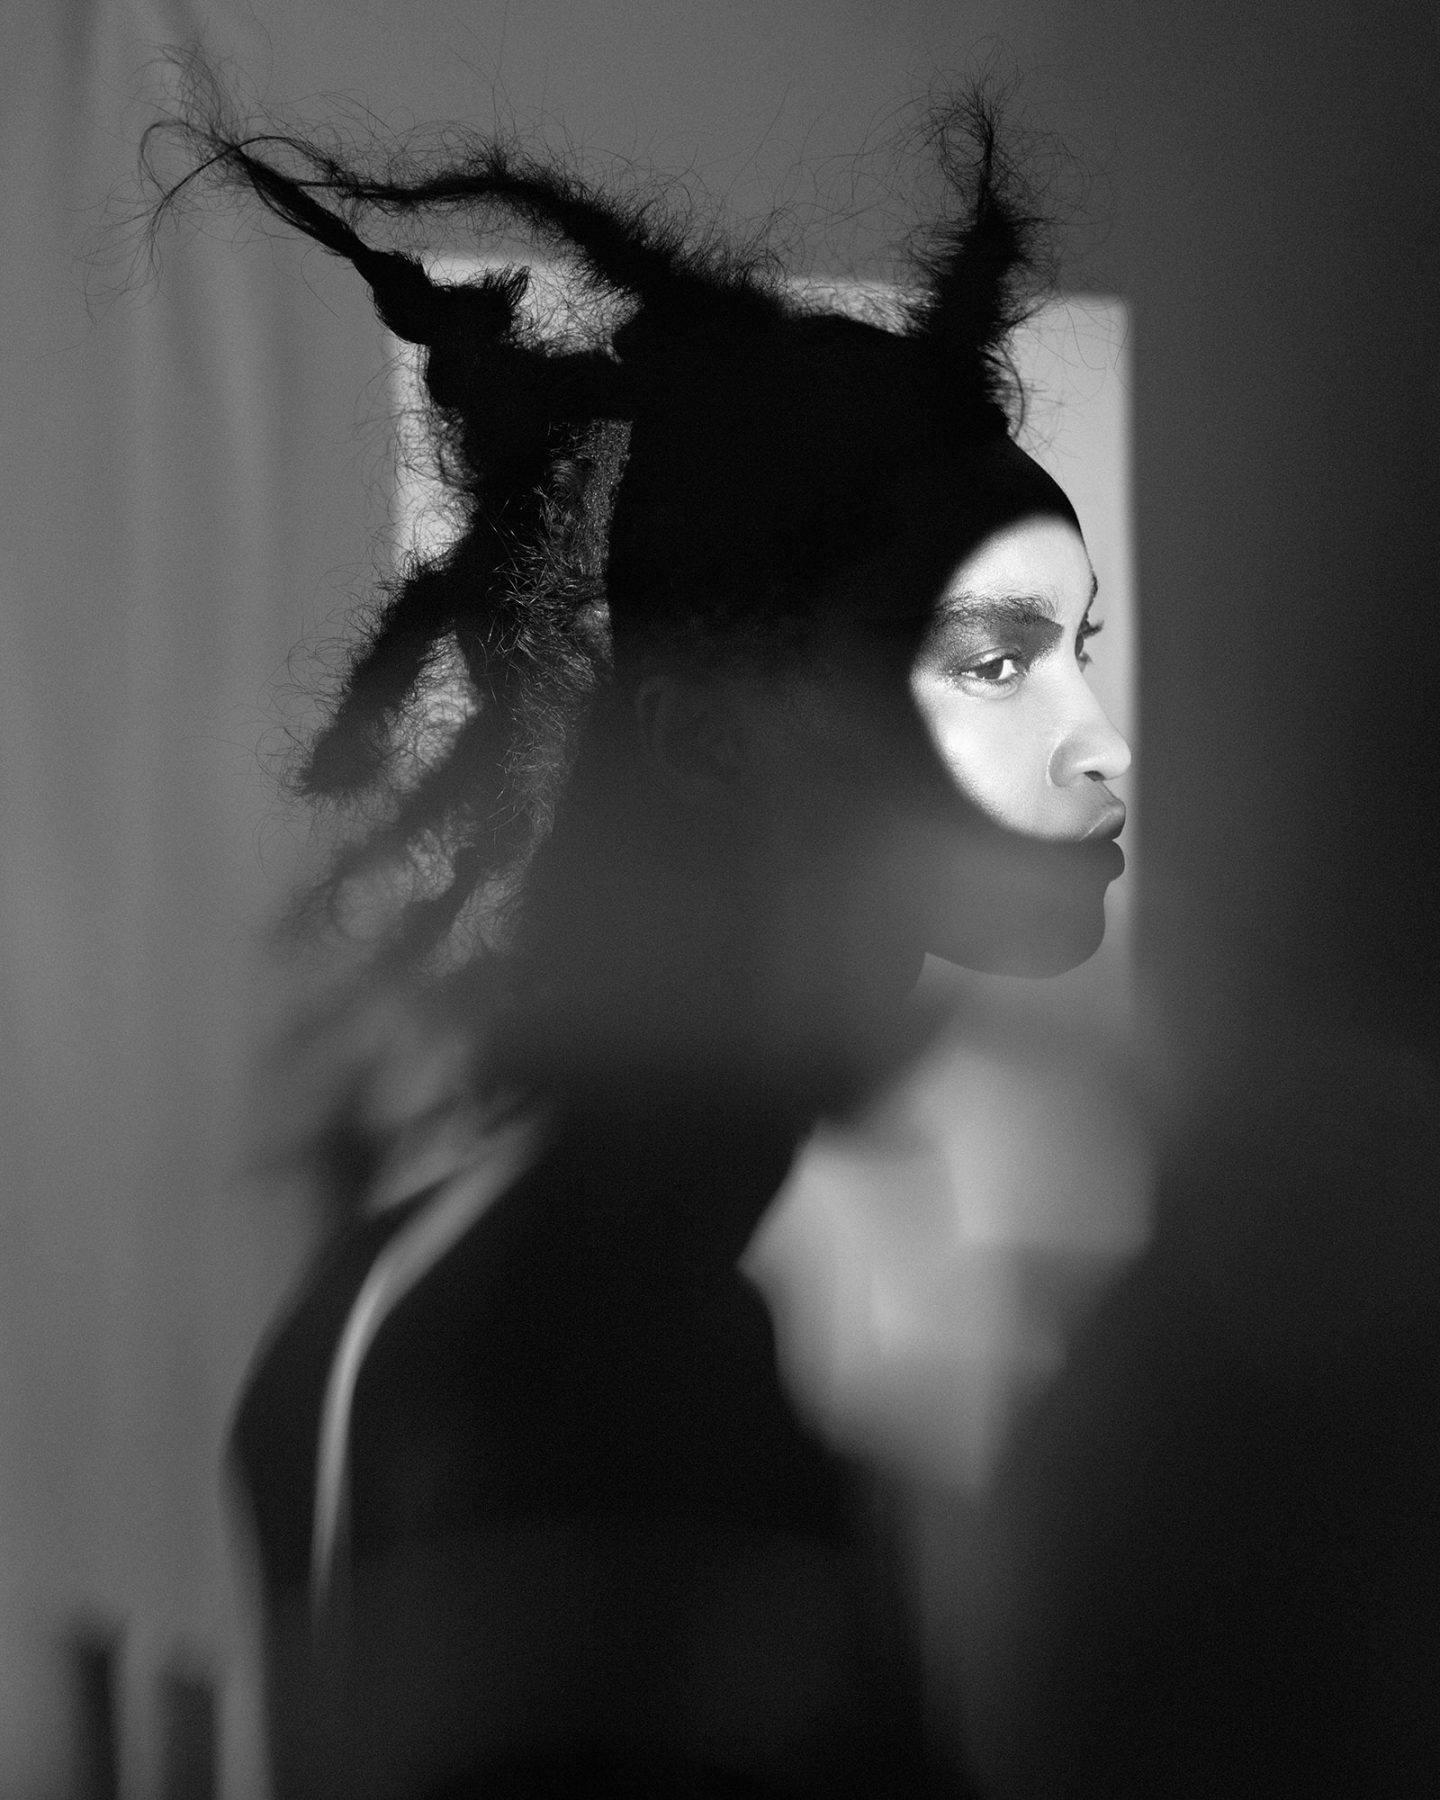 IGNANT-Photography-MarcusSchaefer-30